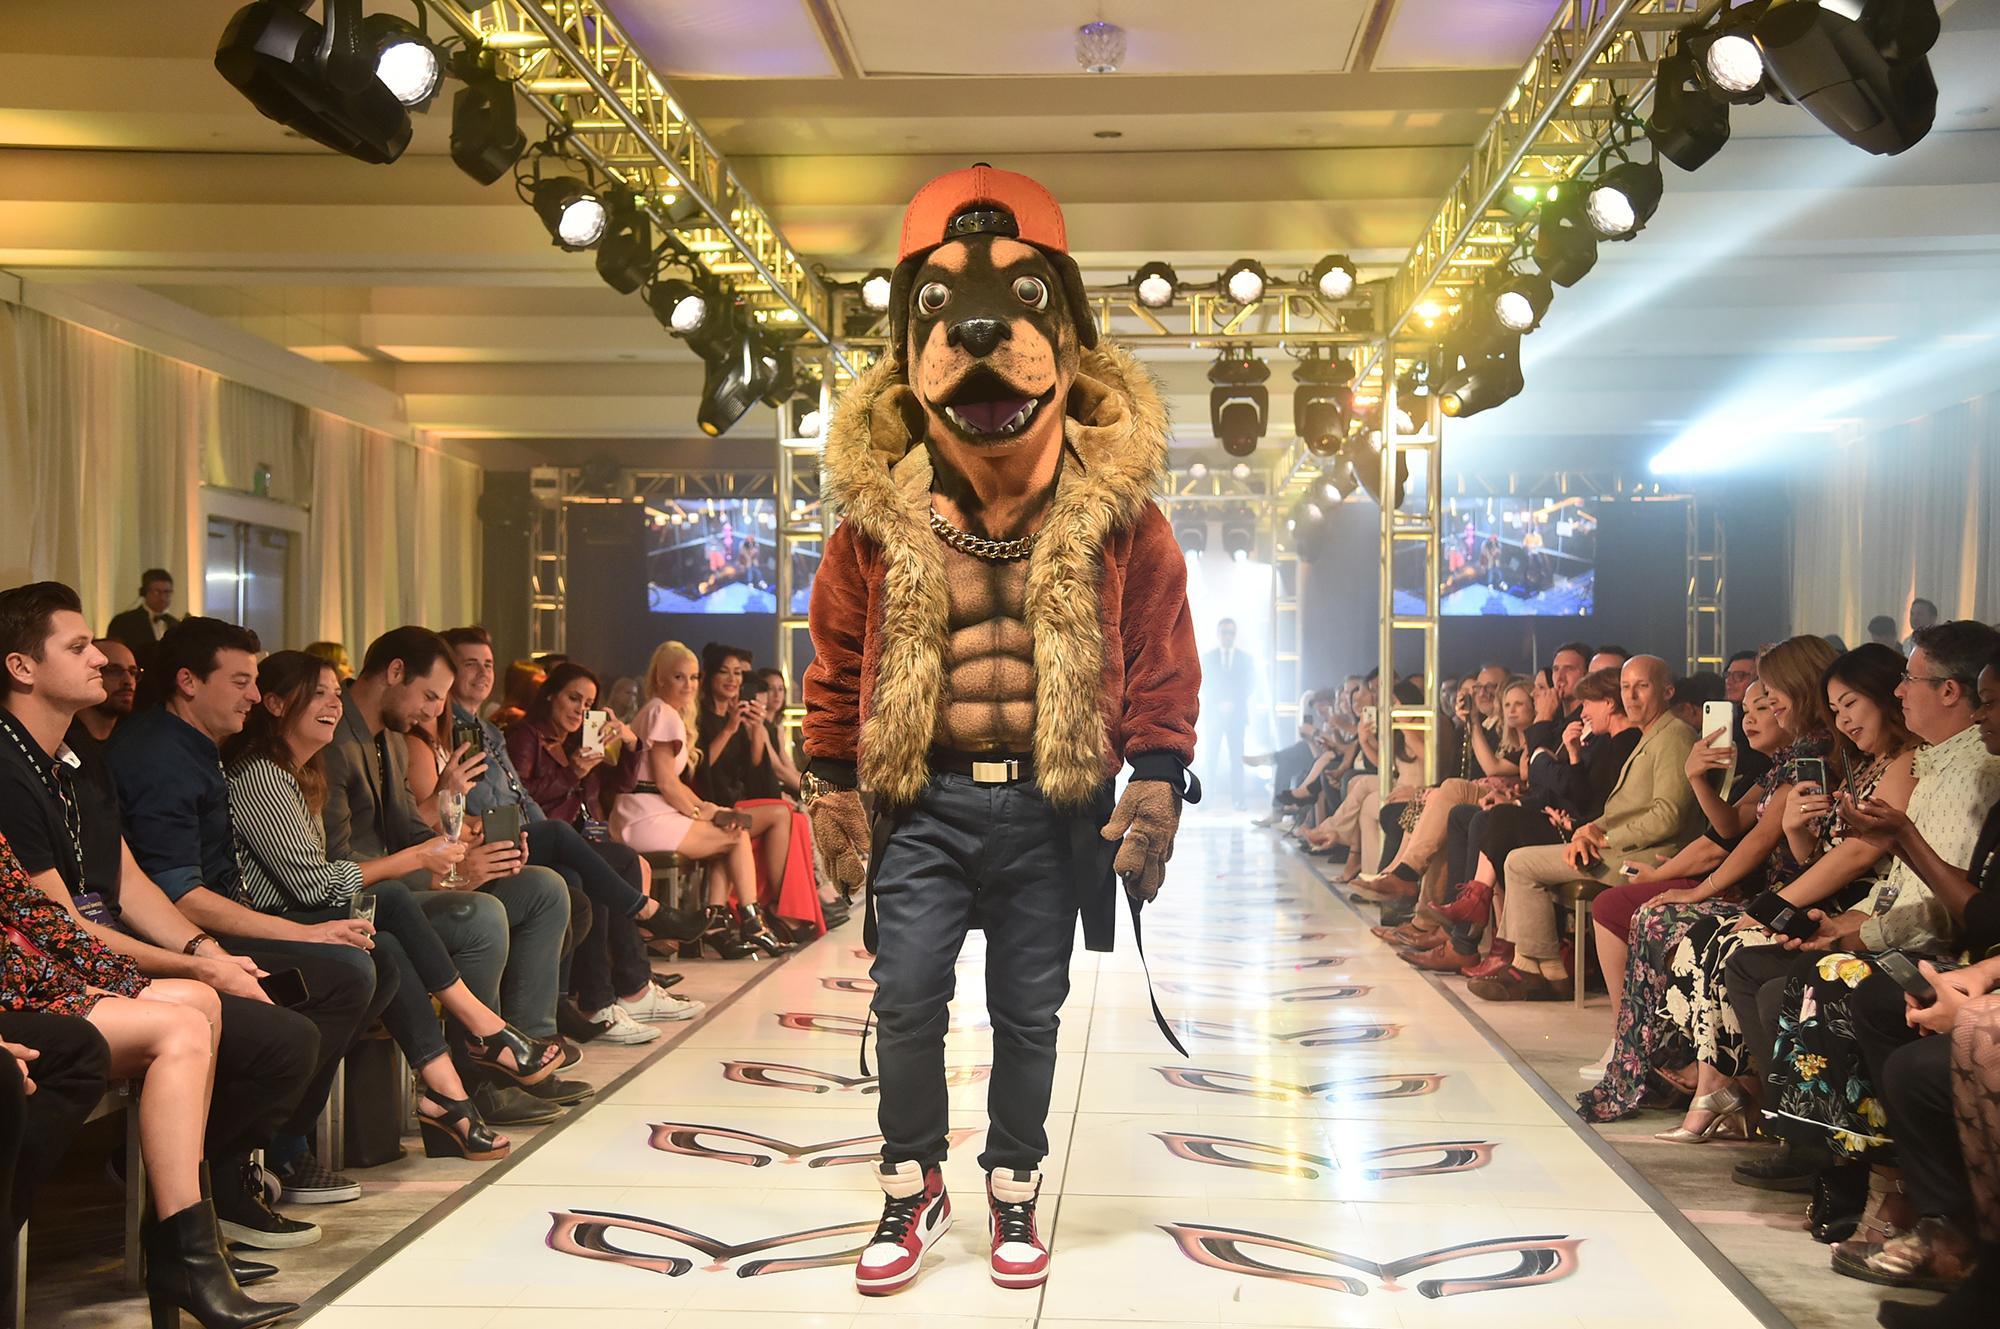 masked-singer-rottweiler-1569441935469.jpg